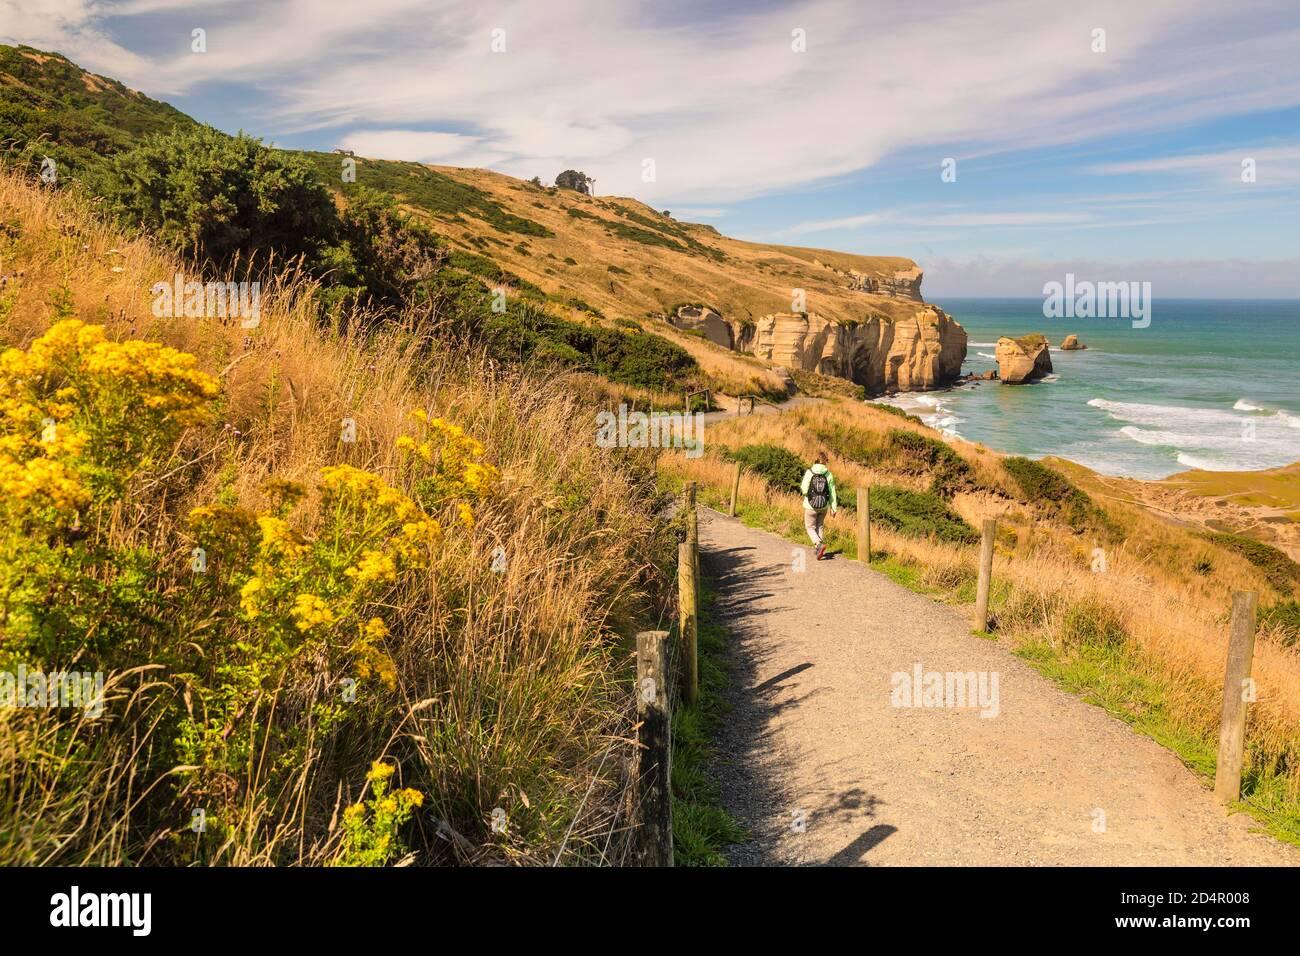 Wanderweg nach Tunnel Beach, Ozeanien, Dunedin, Otago, Südinsel, Neuseeland, Ozeanien Stockfoto